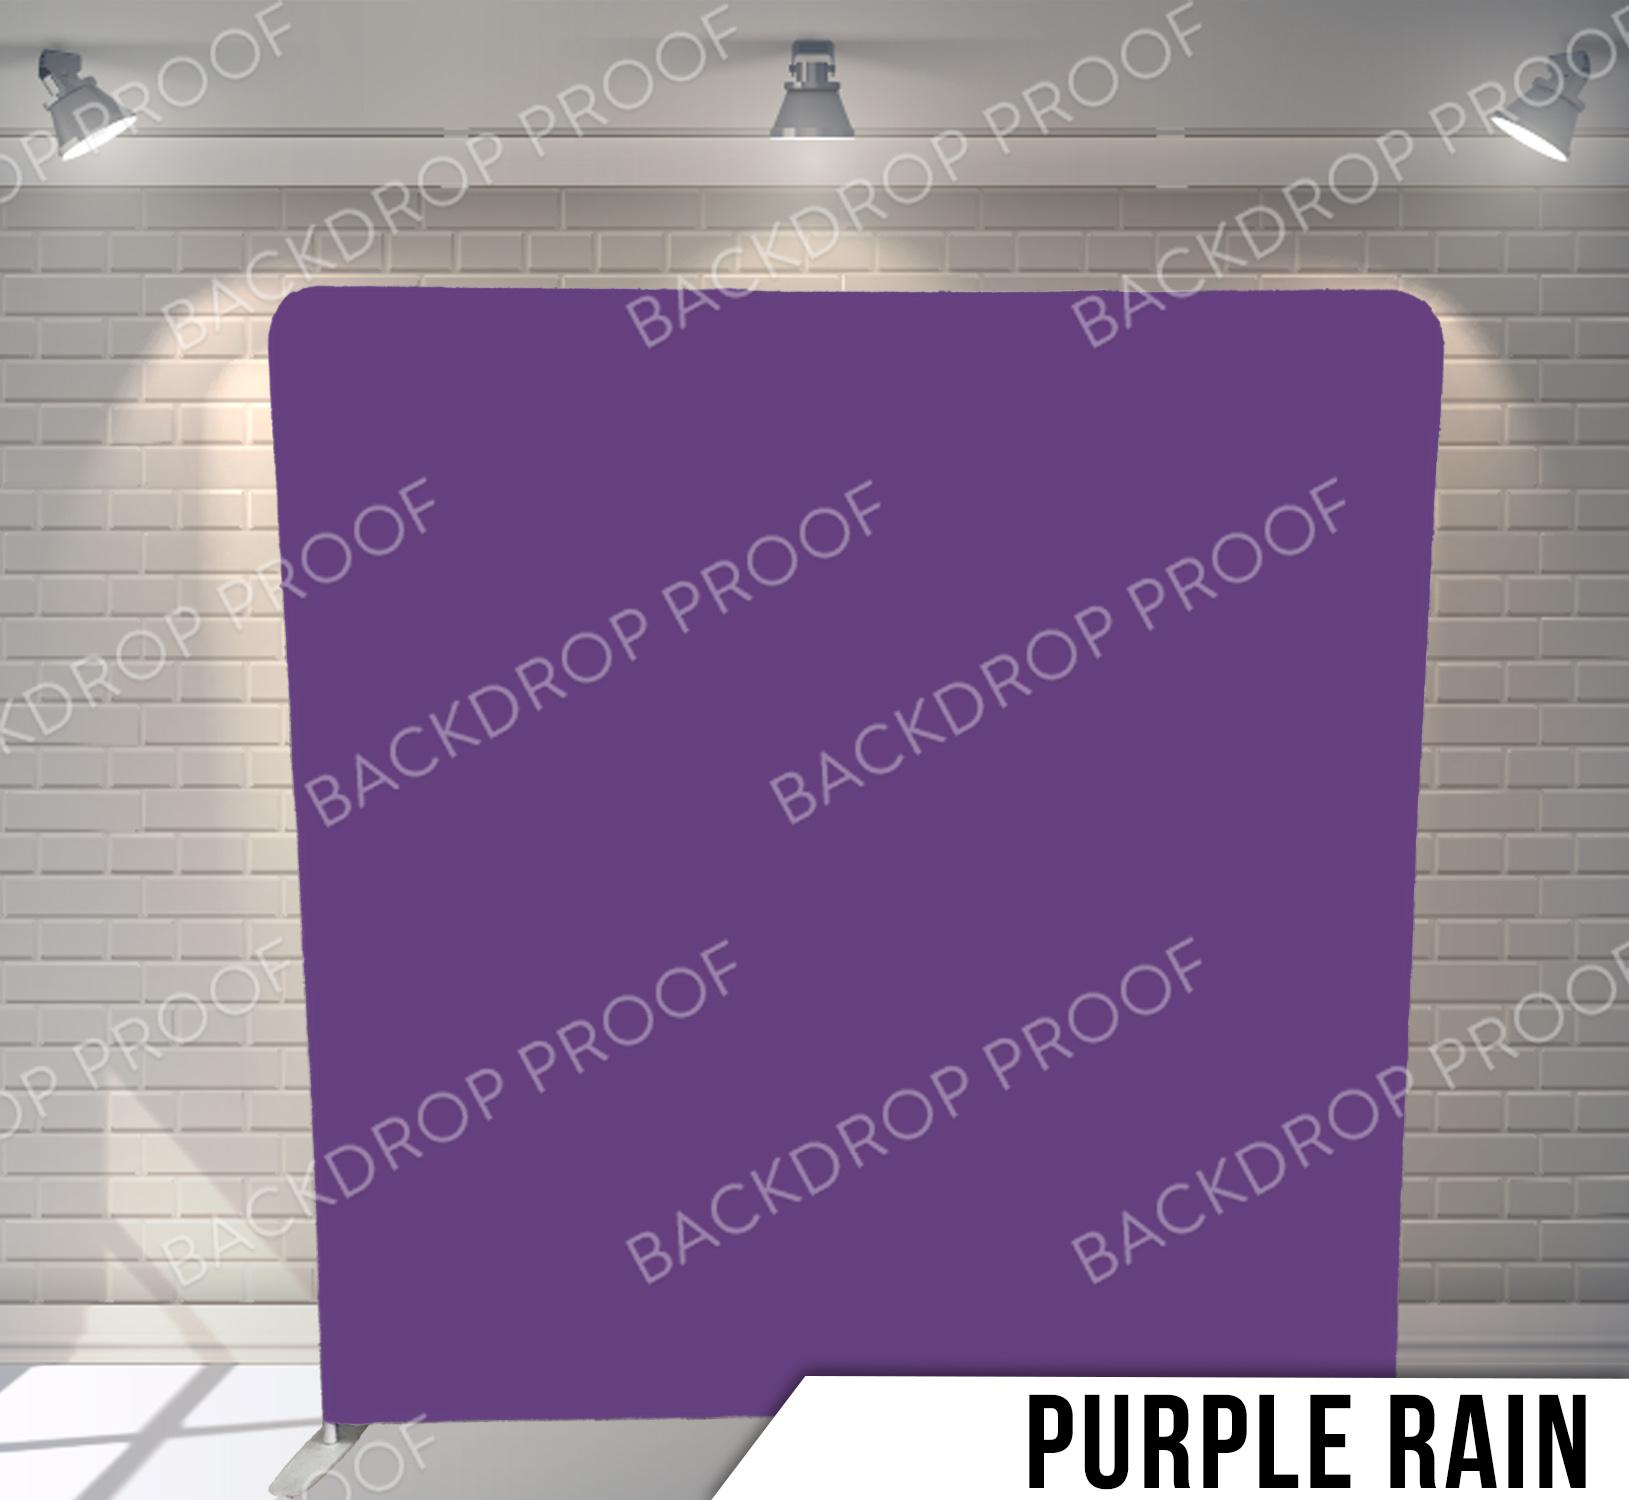 Pillow_PurpleRain_G (1).jpg